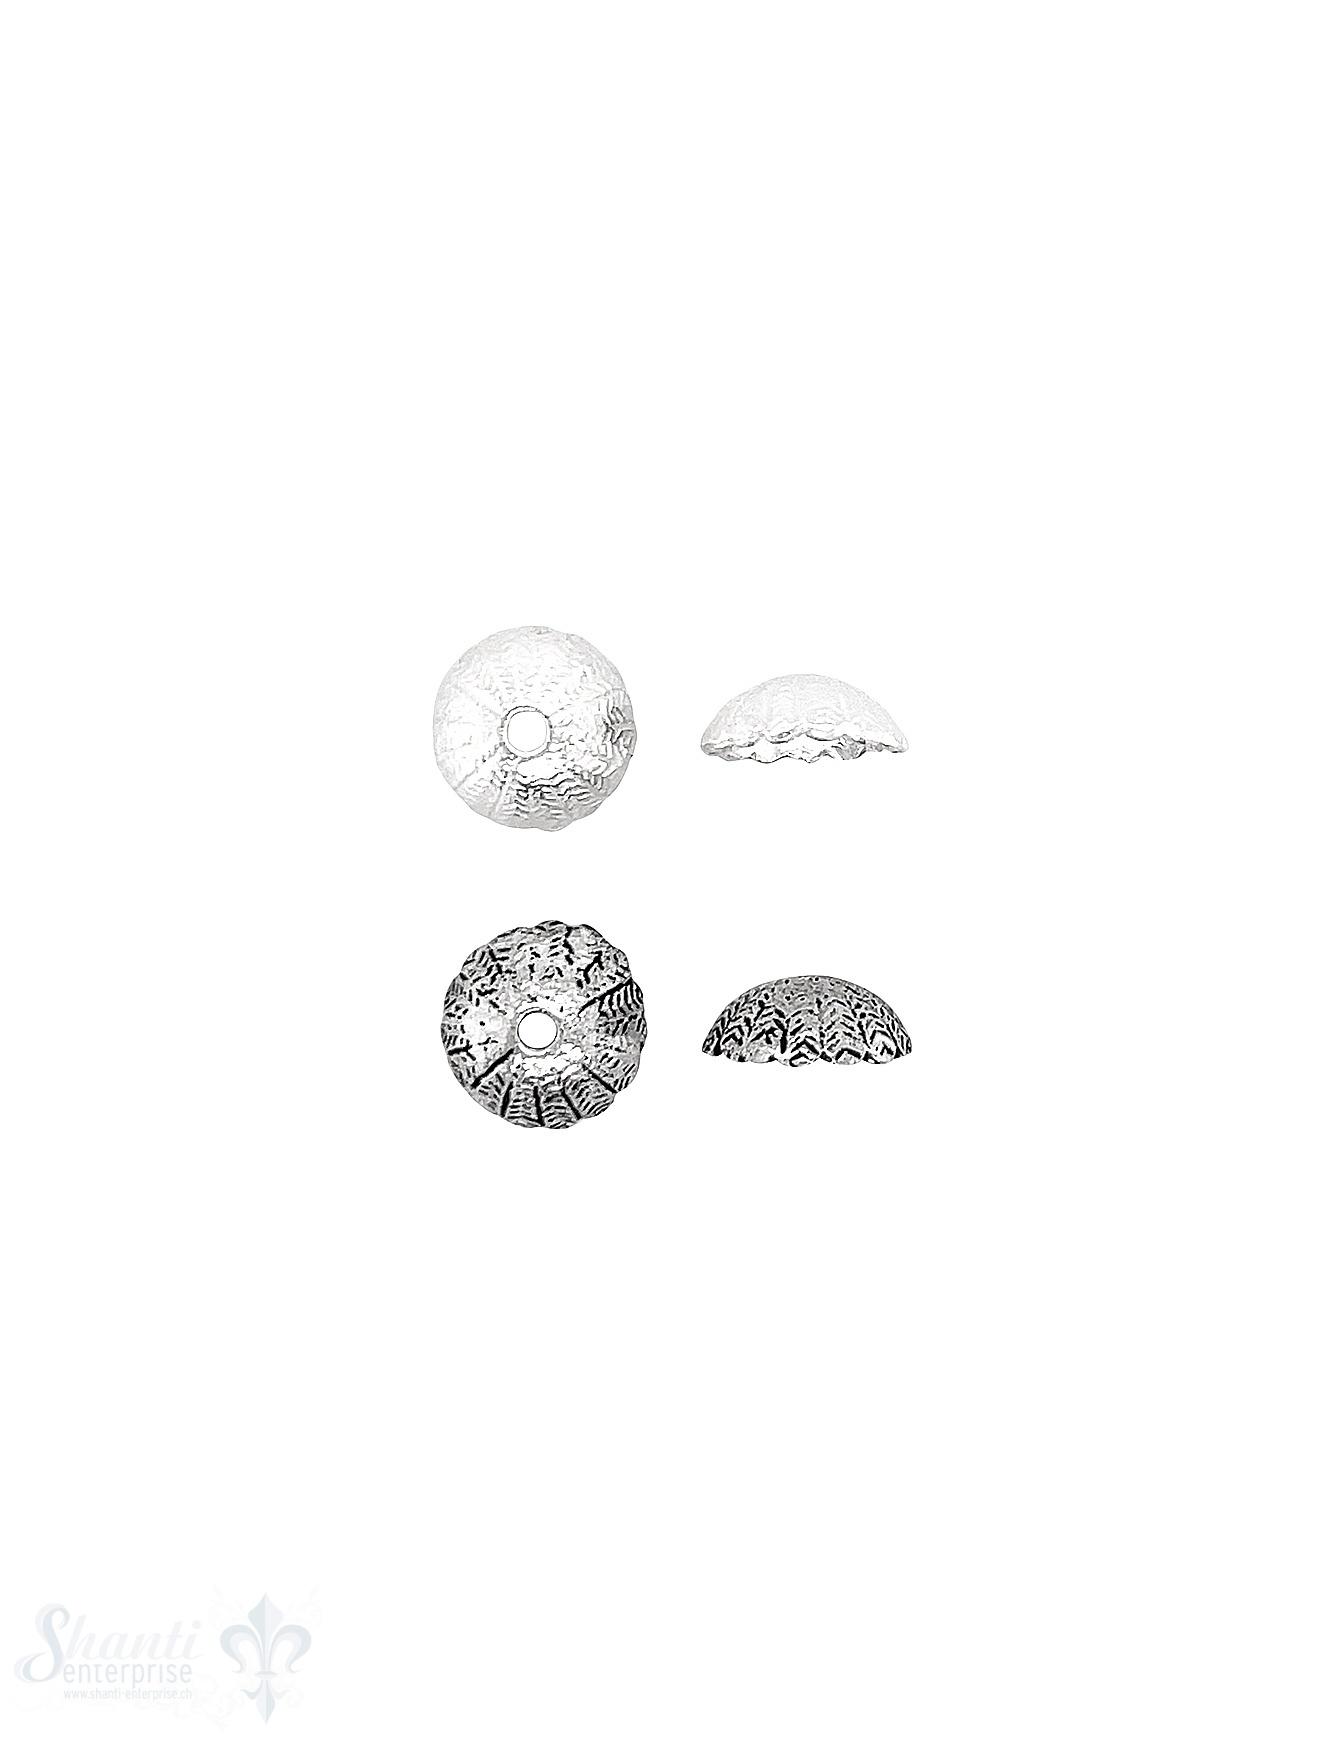 Feder Perlkappe 10x3,7 mm fein strukturiert eingeritzt Silber 925 ID 1.6 mm 1 Pack = 8 Stk. ca. 5 gr.